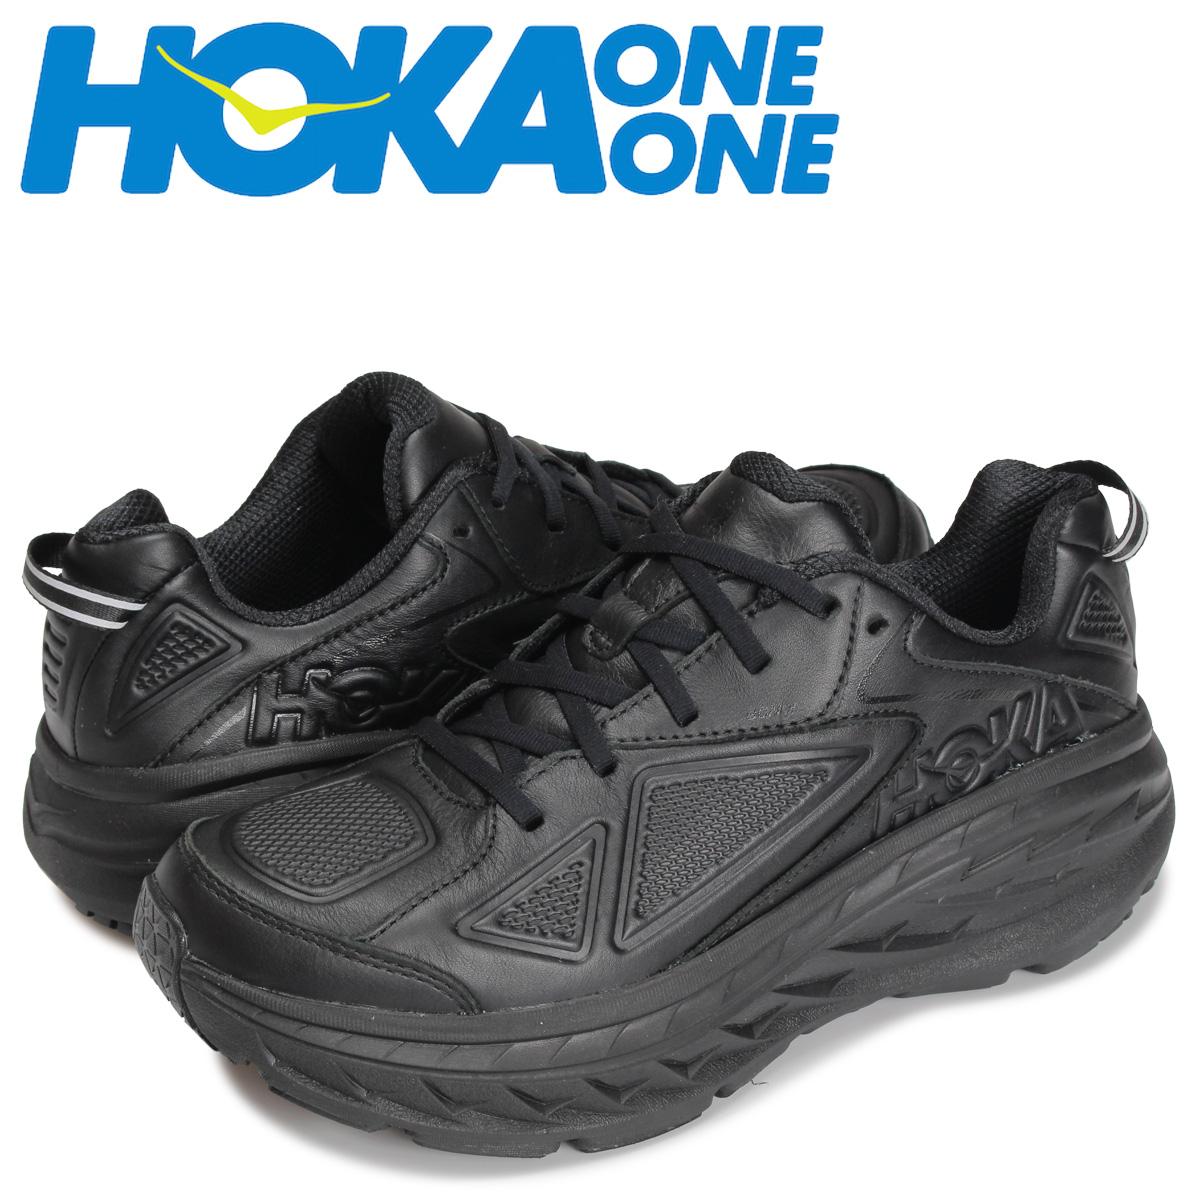 HOKA ONEONE ホカオネオネ ボンダイ レーザー スニーカー メンズ 厚底 BONDI LEATHER ブラック 黒 1019496